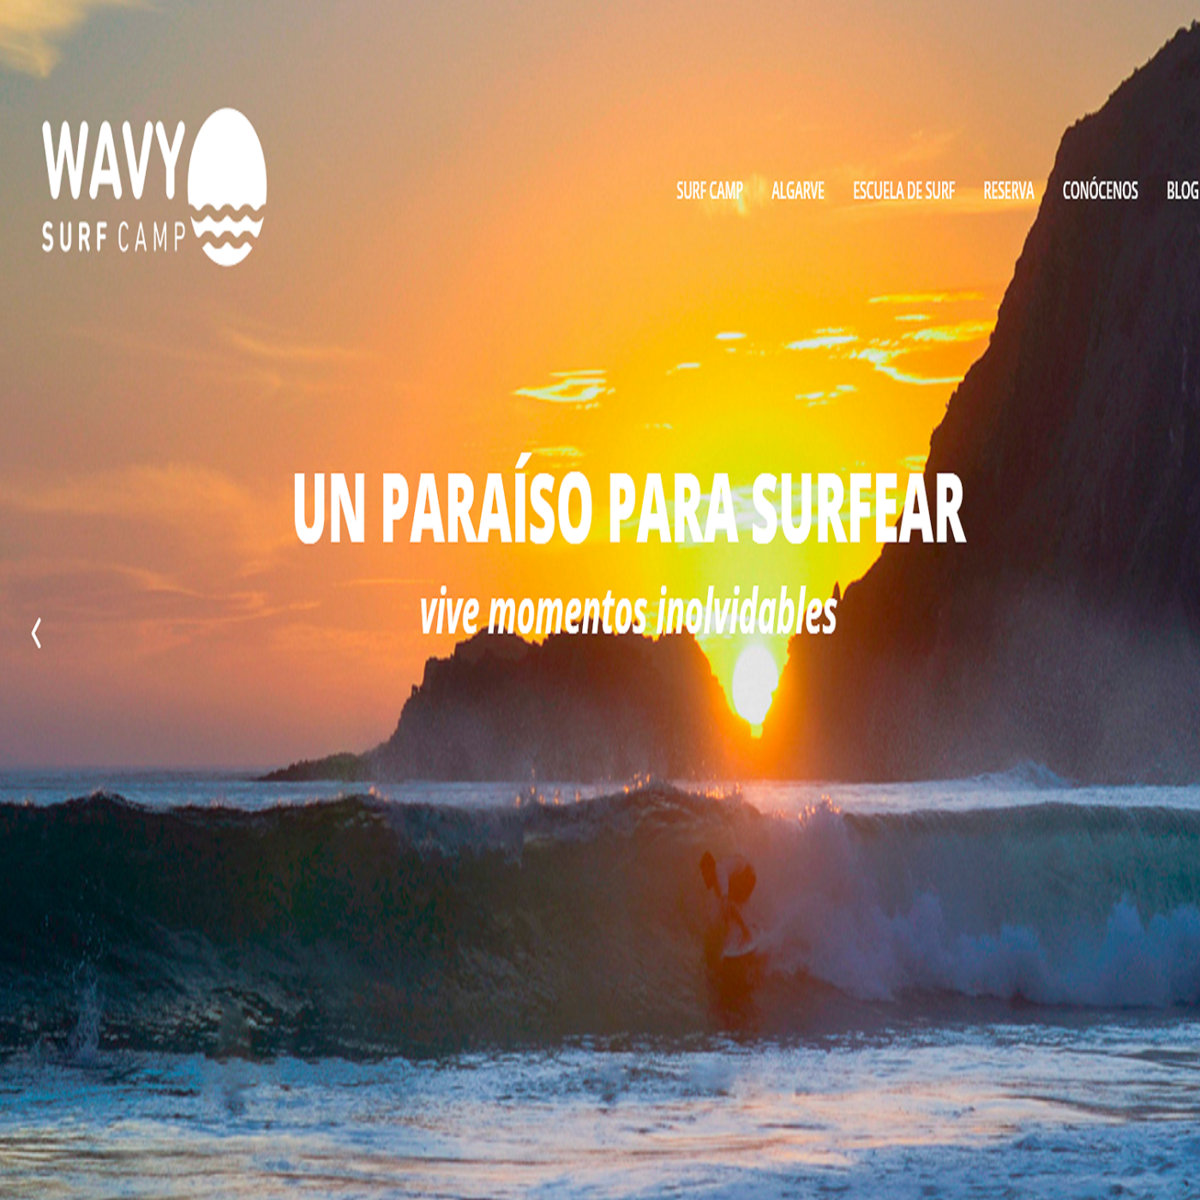 surfcamp - wavy surf camp | surfcamp - wavy surf camp